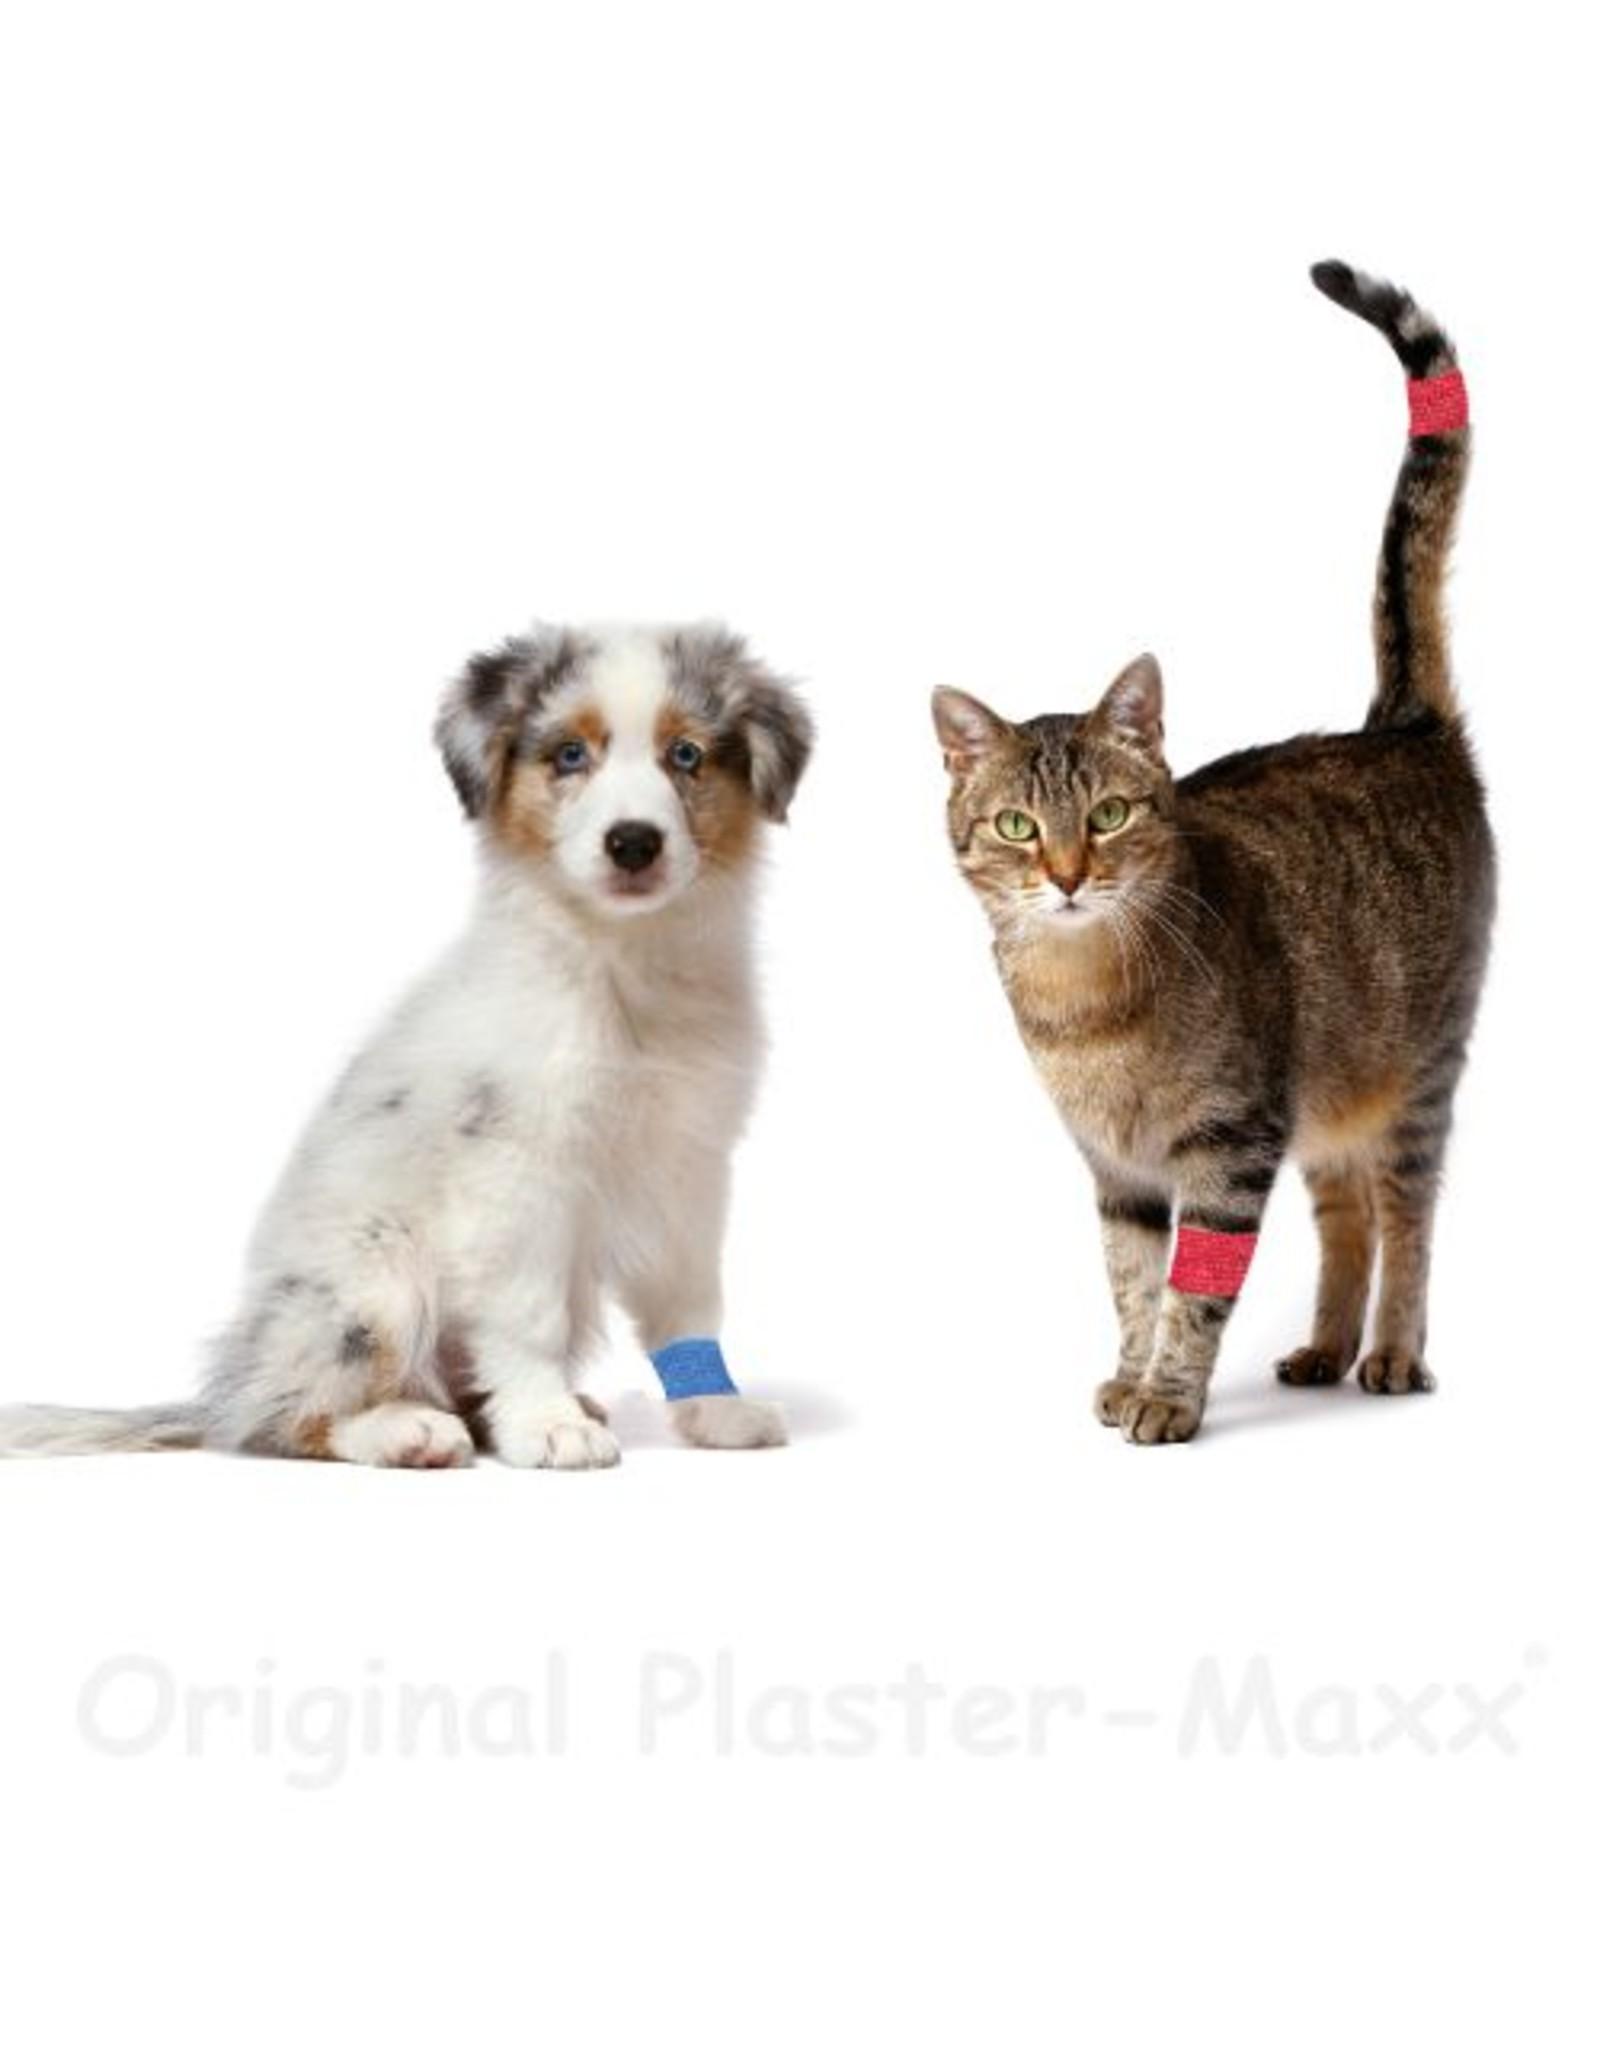 Plaster-Maxx Plaster-Maxx - Sparset 1xHaut, 1xRot, 1xBlau